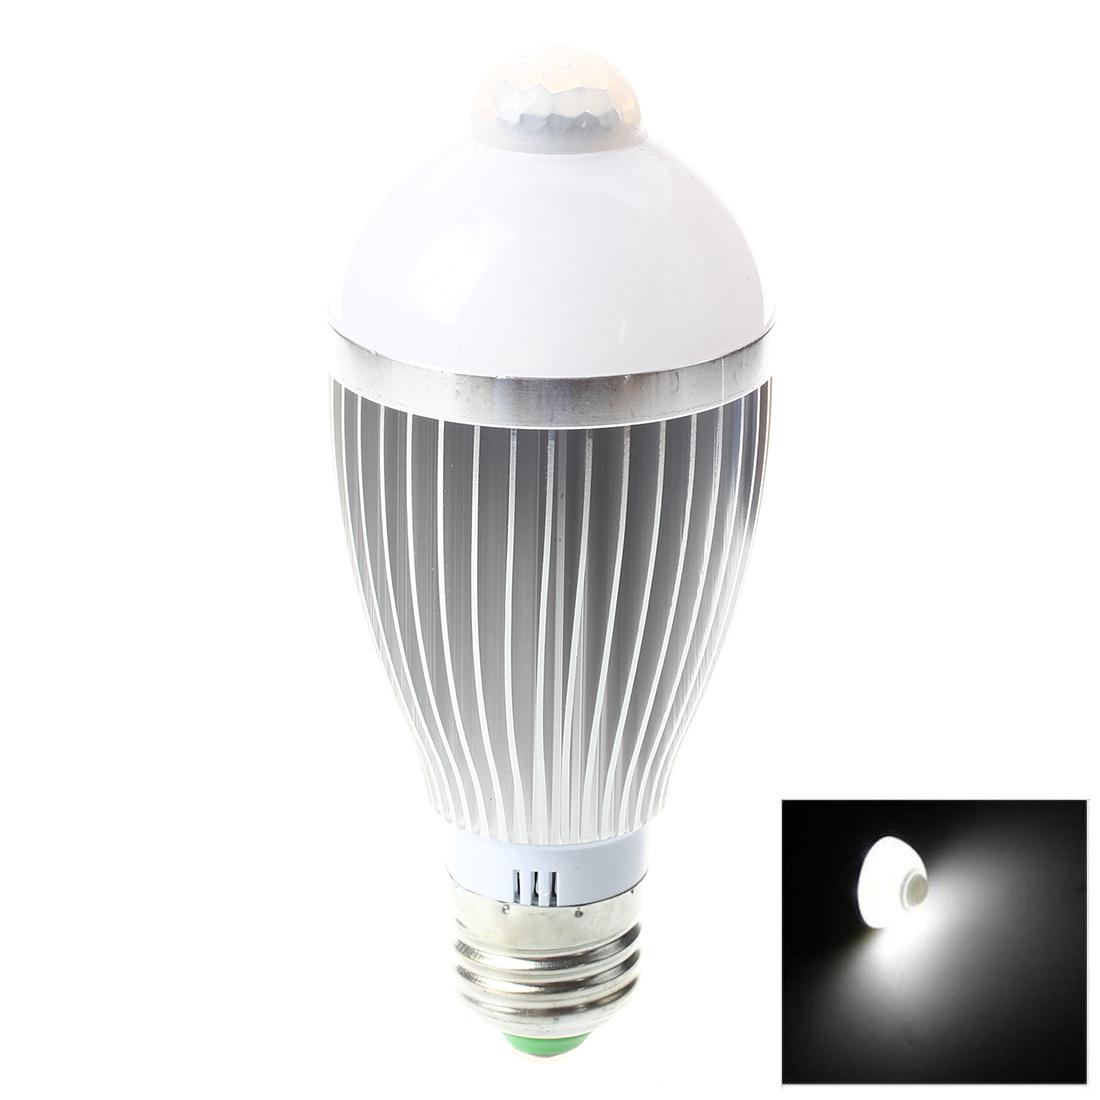 e27 ir bewegungsmelder a g6 led birne lampe 6w 600lm licht m9 ebay. Black Bedroom Furniture Sets. Home Design Ideas